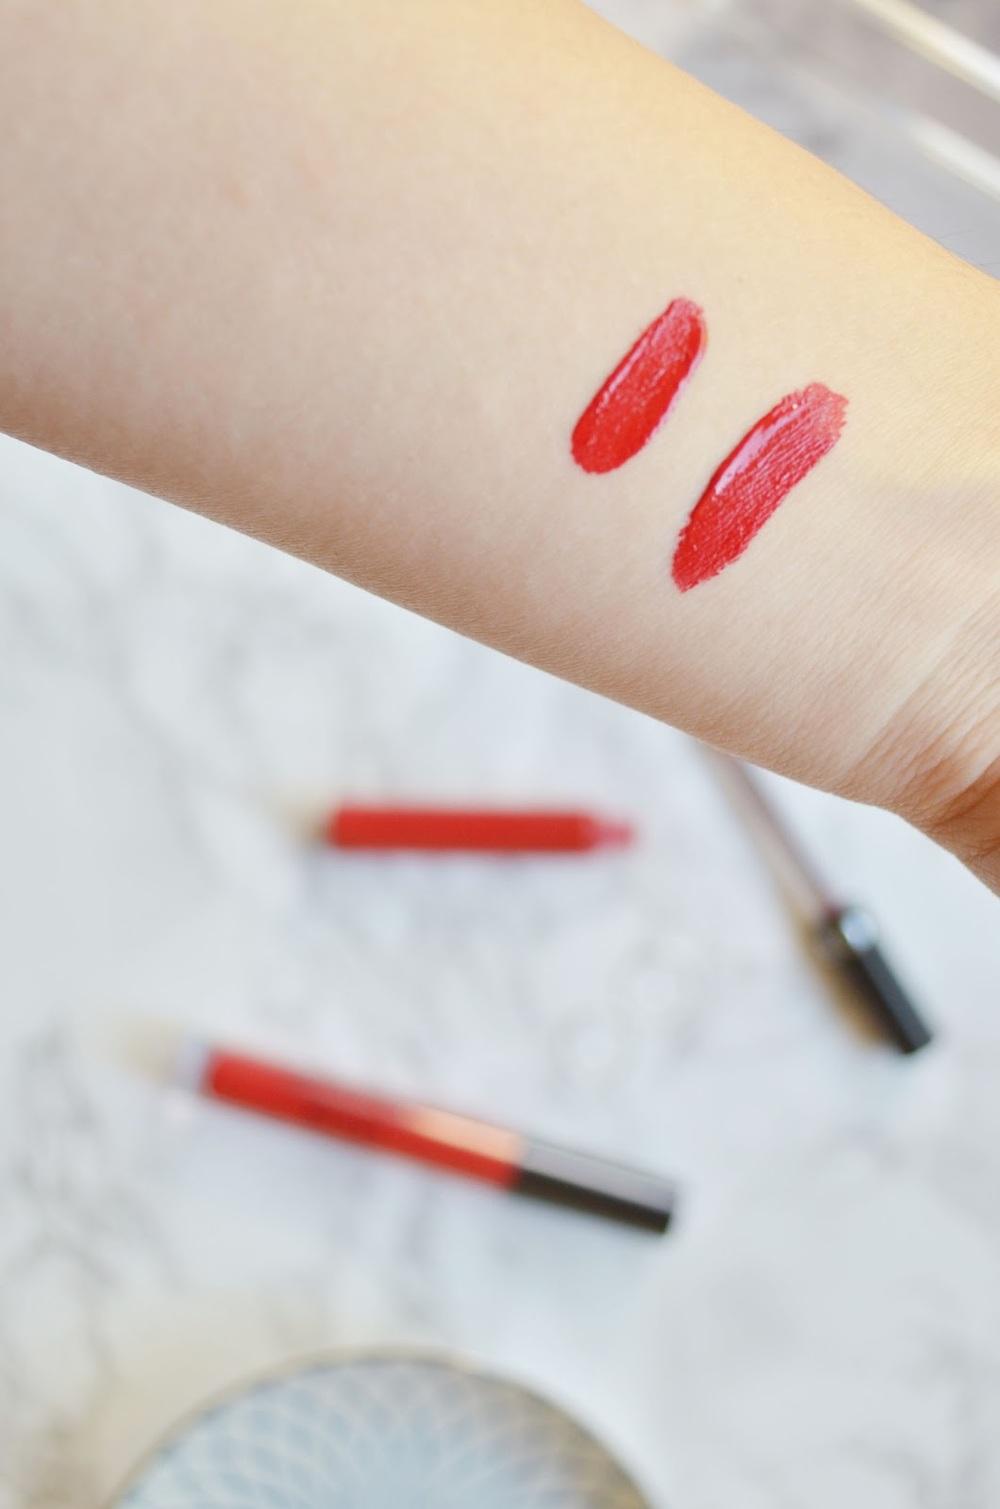 Red Liquid Lipsticks, Stila Stay All Day Liquid Lipstick Beso, Stila Beso, Sephora Always Red, Sephora Lip Cream